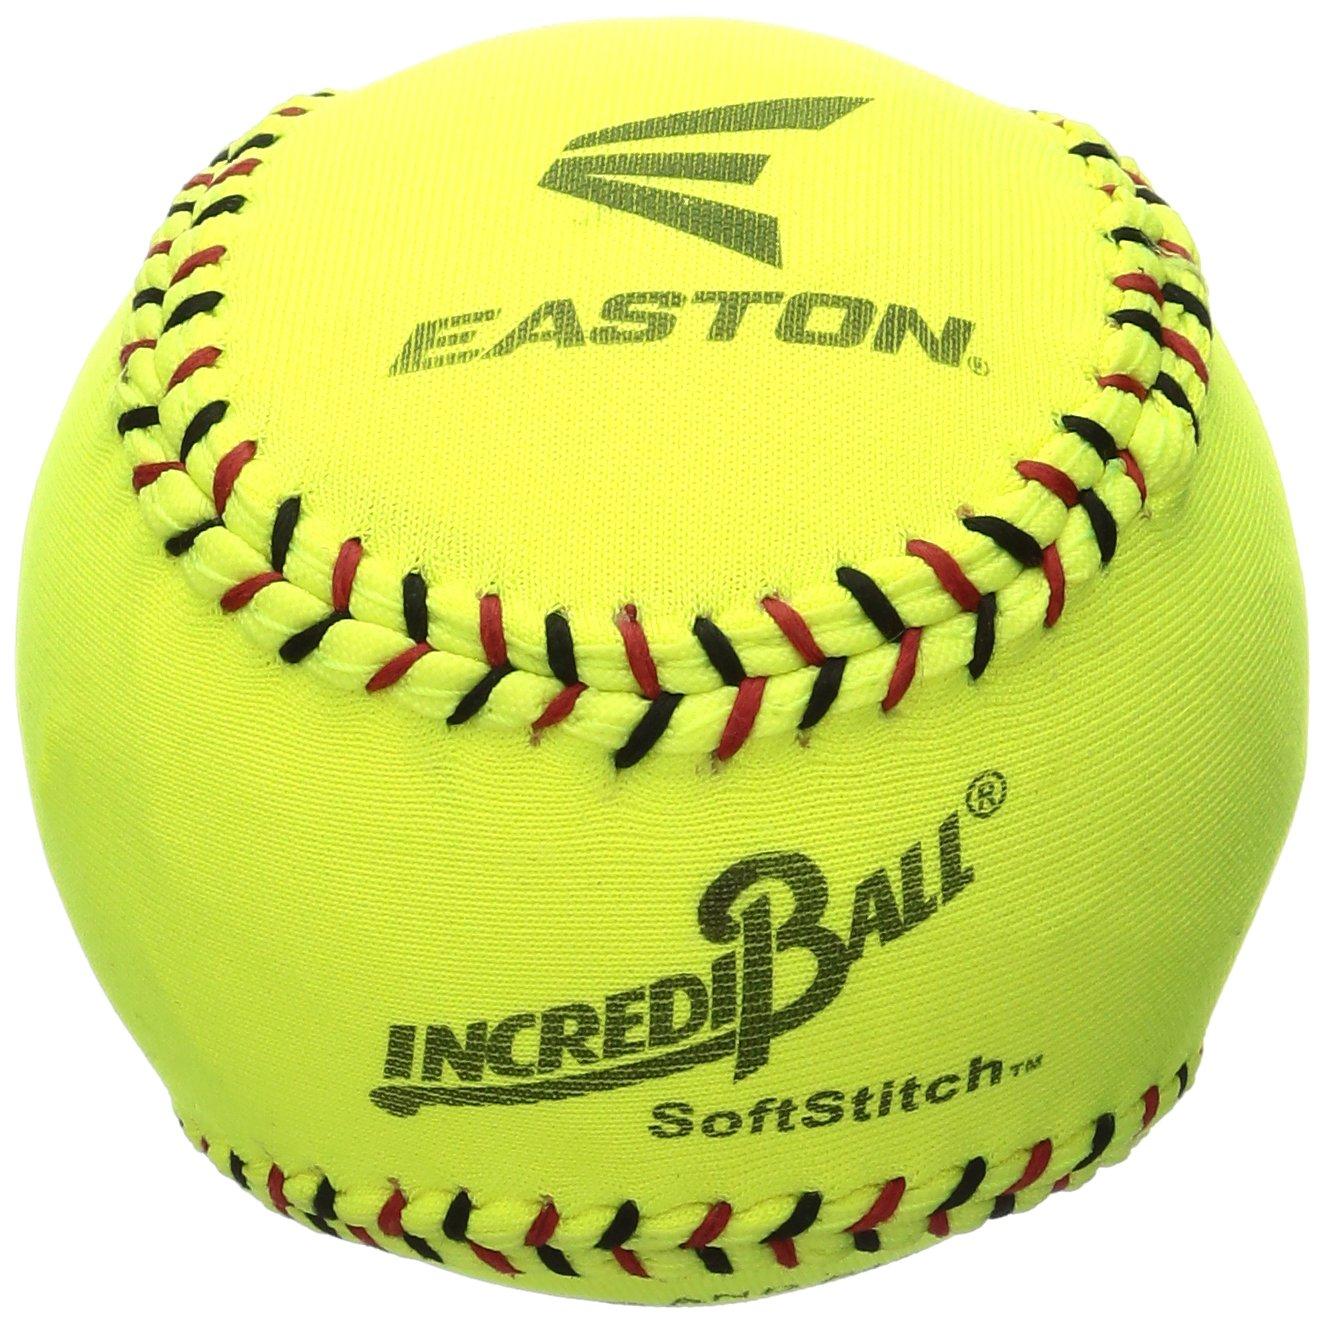 Easton SoftStitch IncrediBall, Yellow, 11-inch 1058291